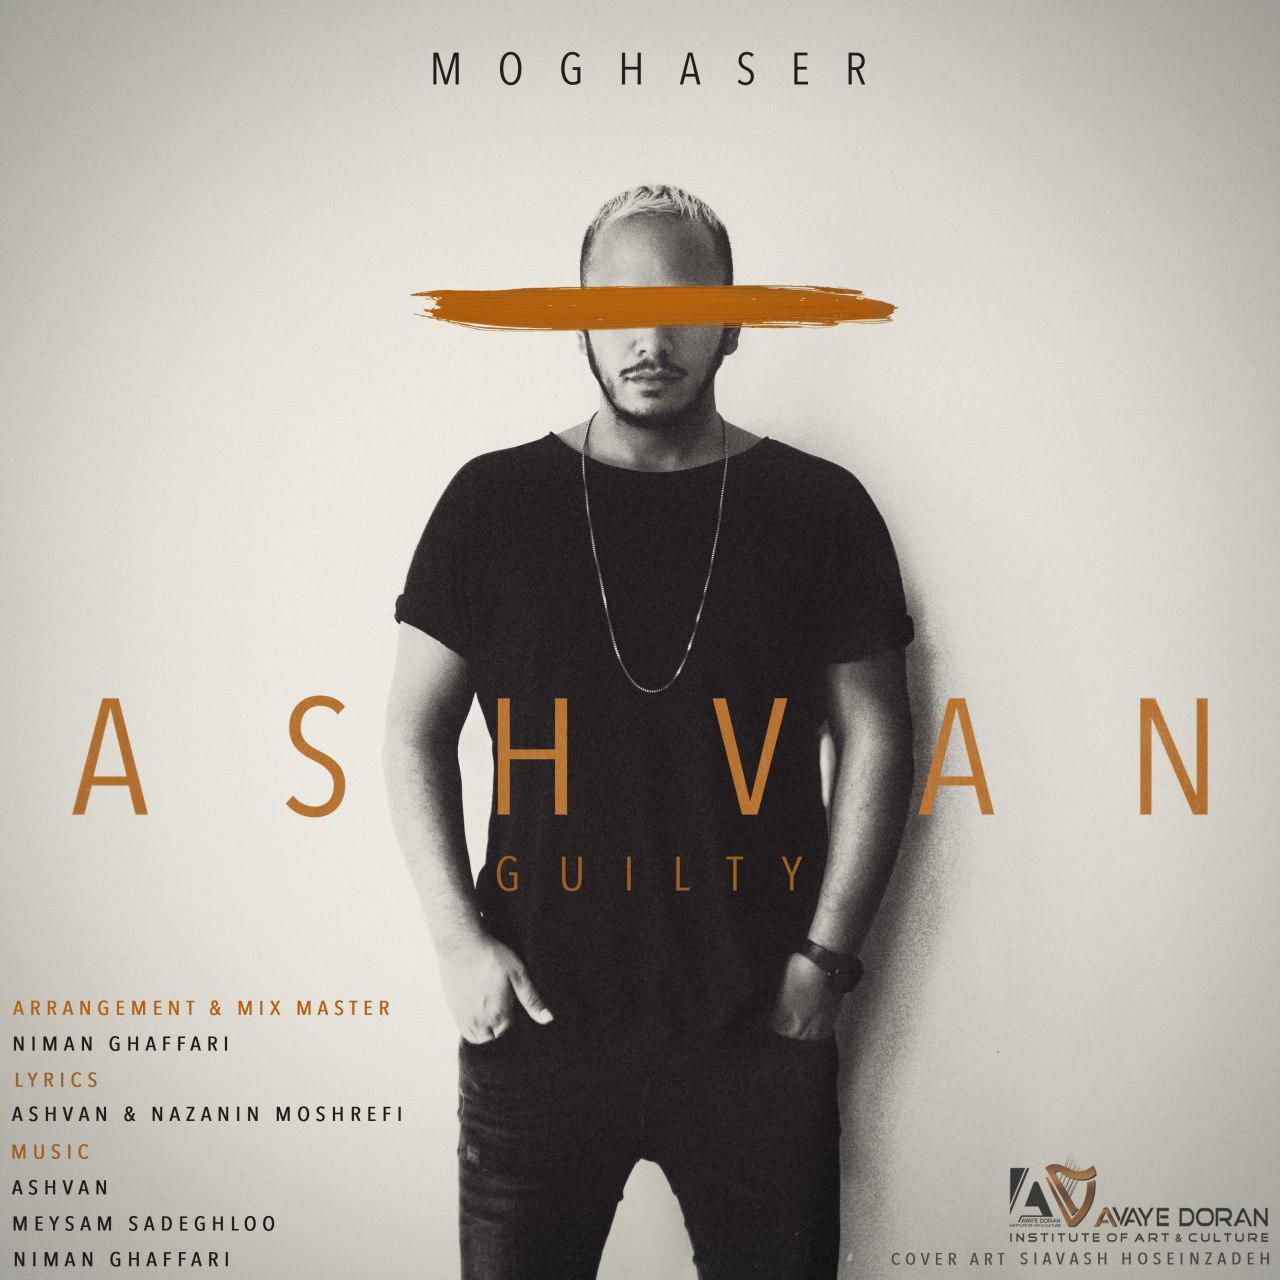 Moghaser-Ashvan Ashvan - Moghaser